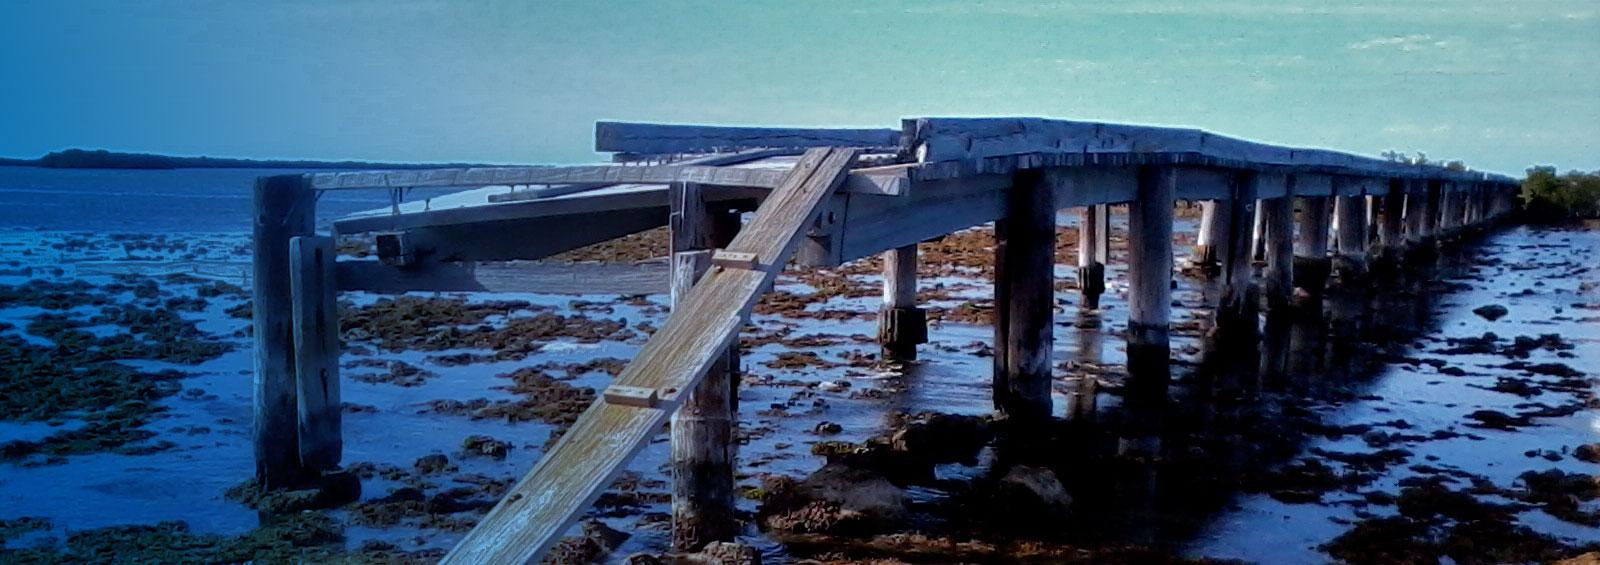 Delapidated bridge, Summerland Key